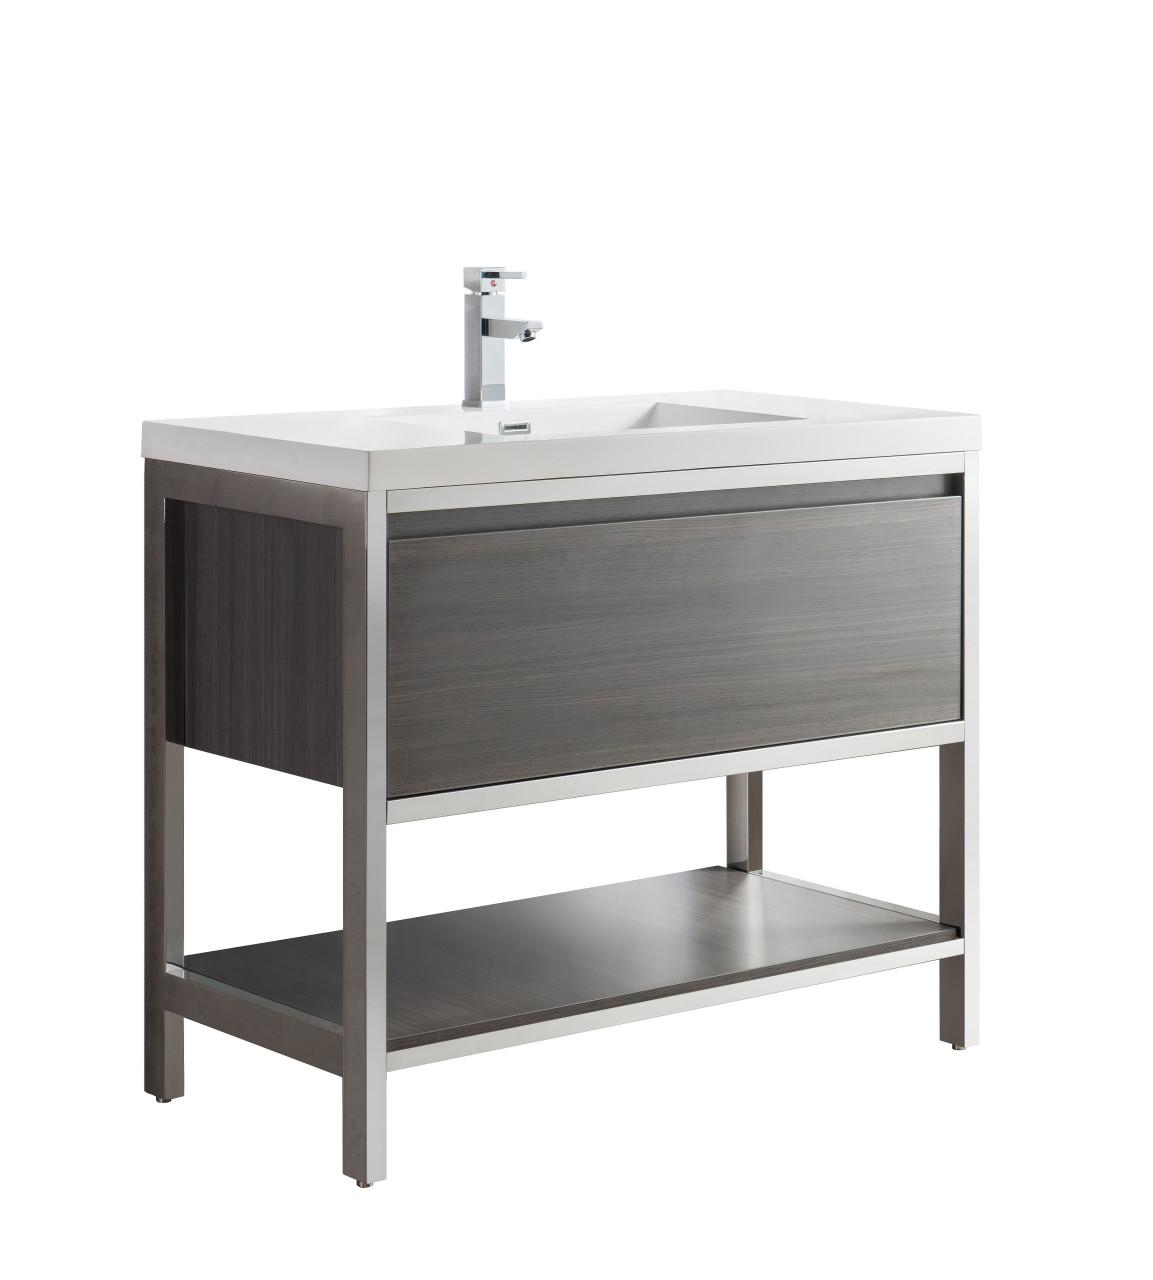 Lake 42 Grey Oak Free Standing Modern Bathroom Vanity With Chrome Stainless Steel Frame With Acrylic Sink Bathroom Vanities Wholesale Inc